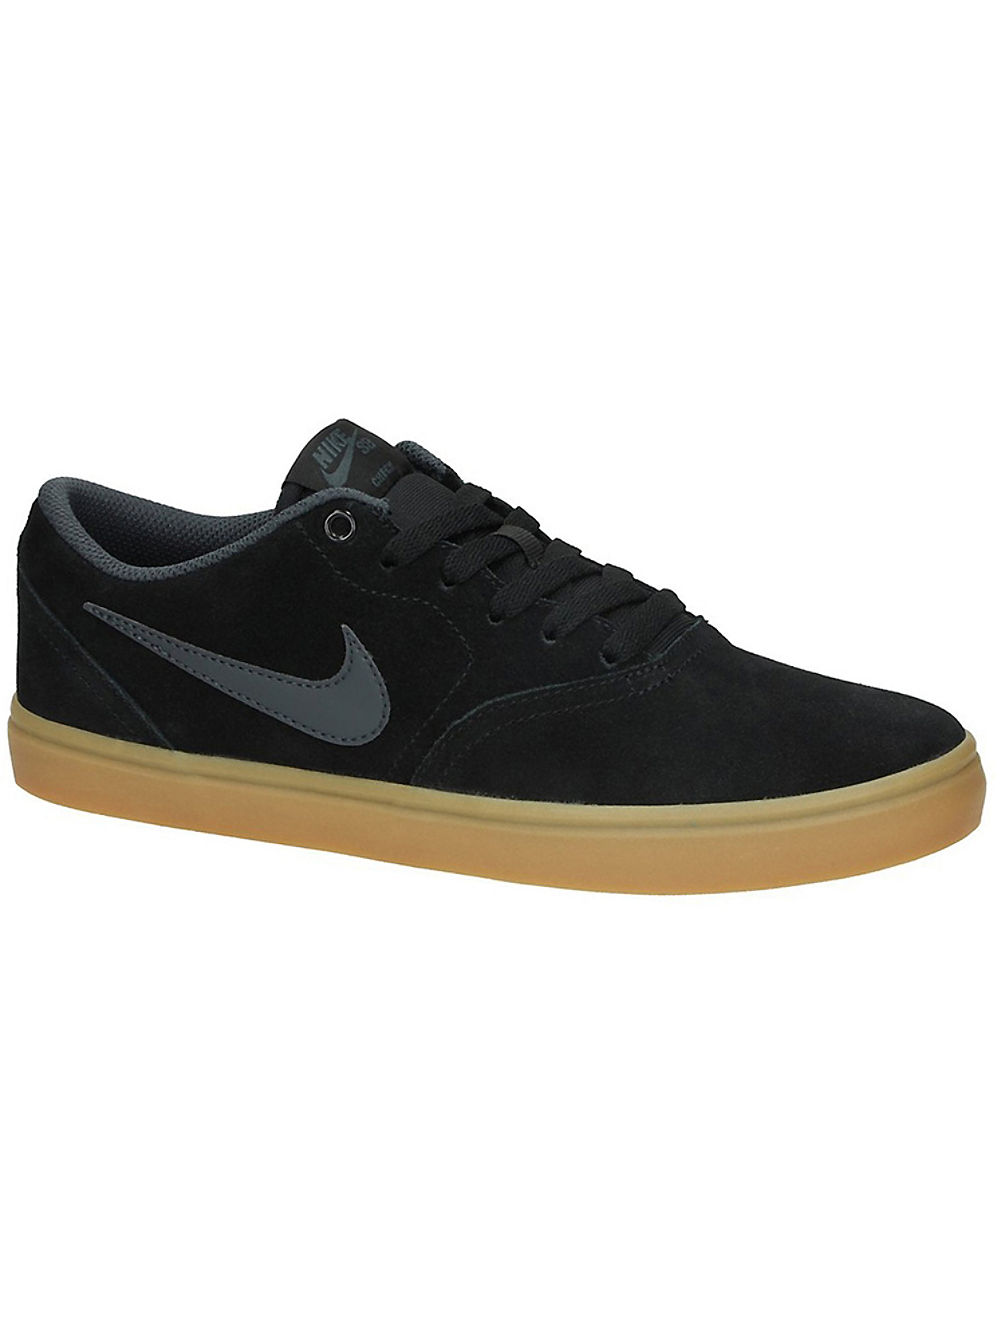 3913f48c9b924 Buy Nike SB Check Solarsoft Skate Shoes online at Blue Tomato